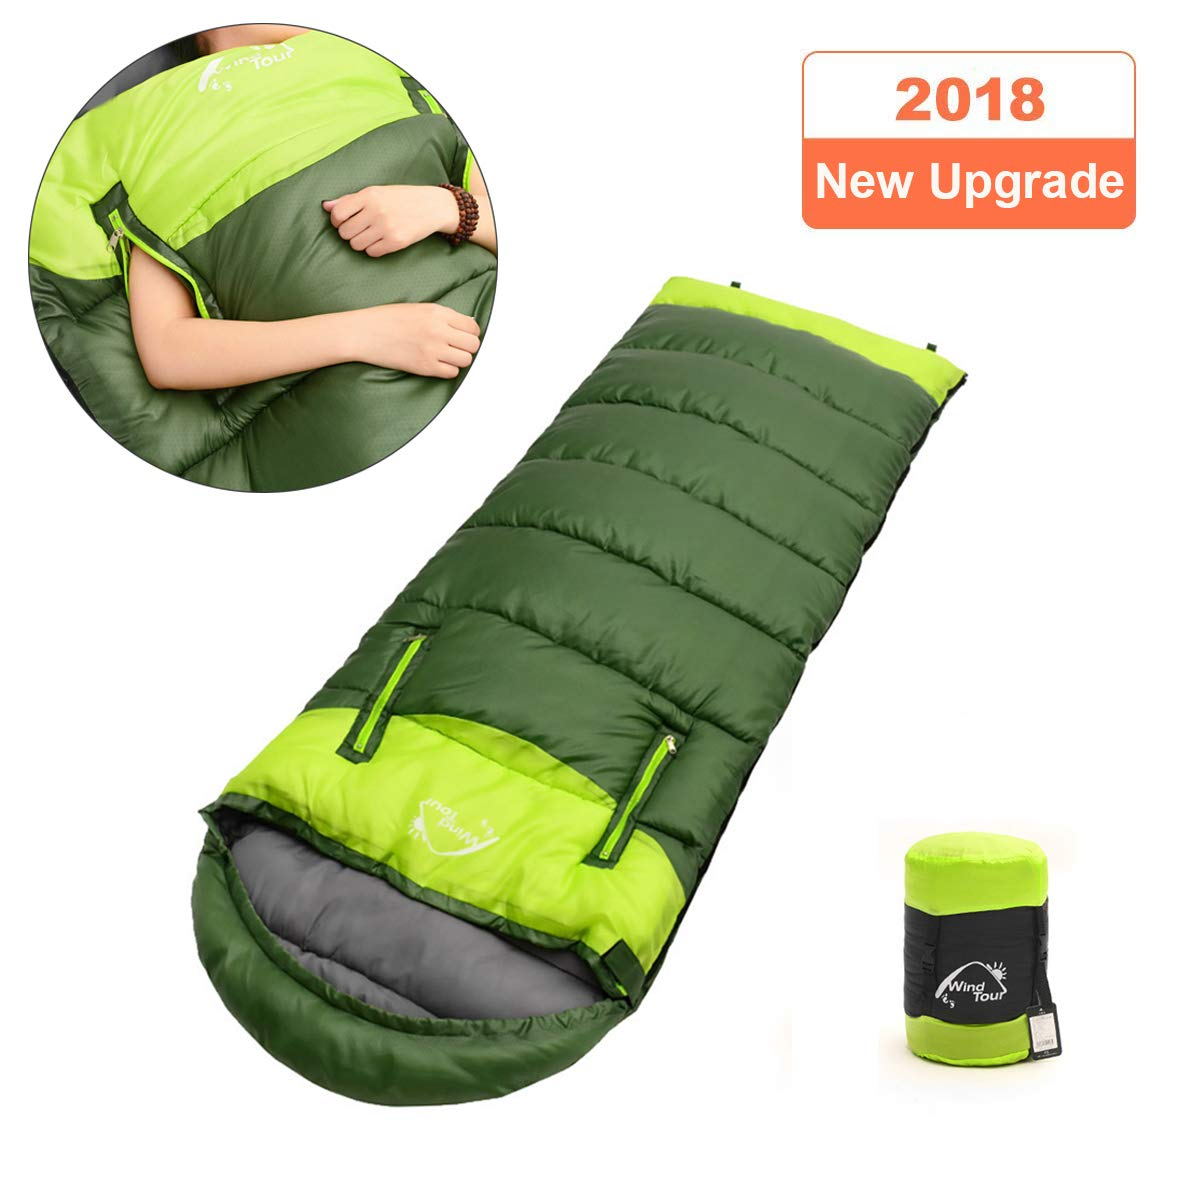 Upstartech Sleeping Bag,Envelope Sleeping Bag Lightweight Mummy Sleeping Bag 4 Season with Free Hand Design for Outdoors,Indoors,Camping,Hiking